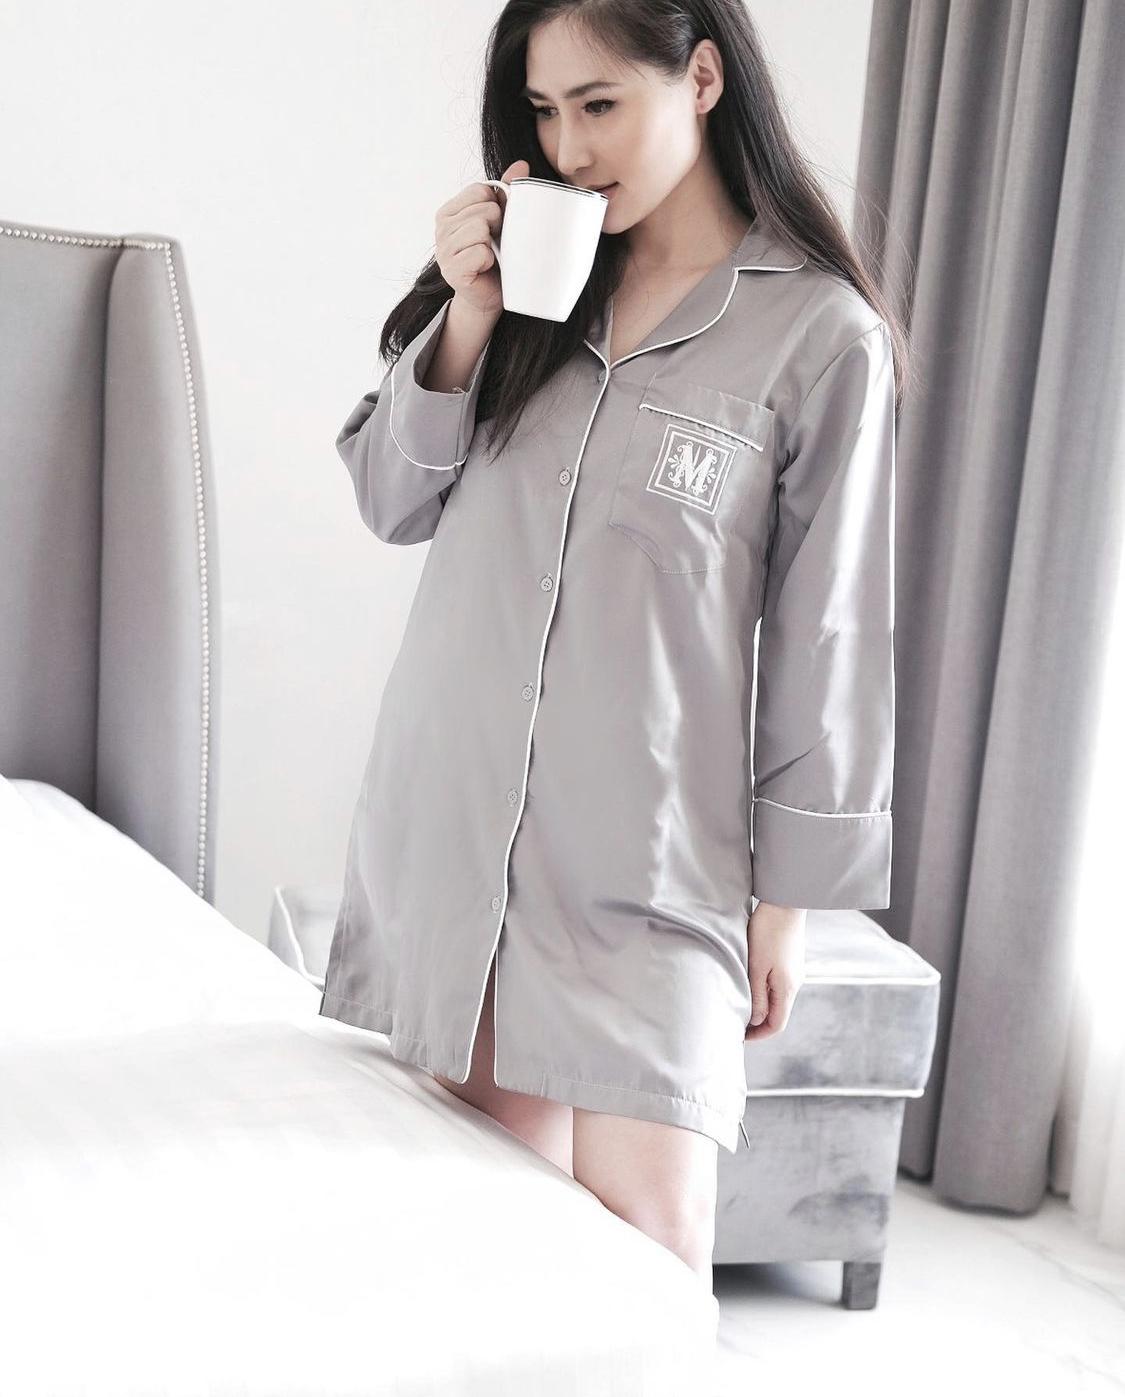 váy ngủ dáng pyjama màu xám